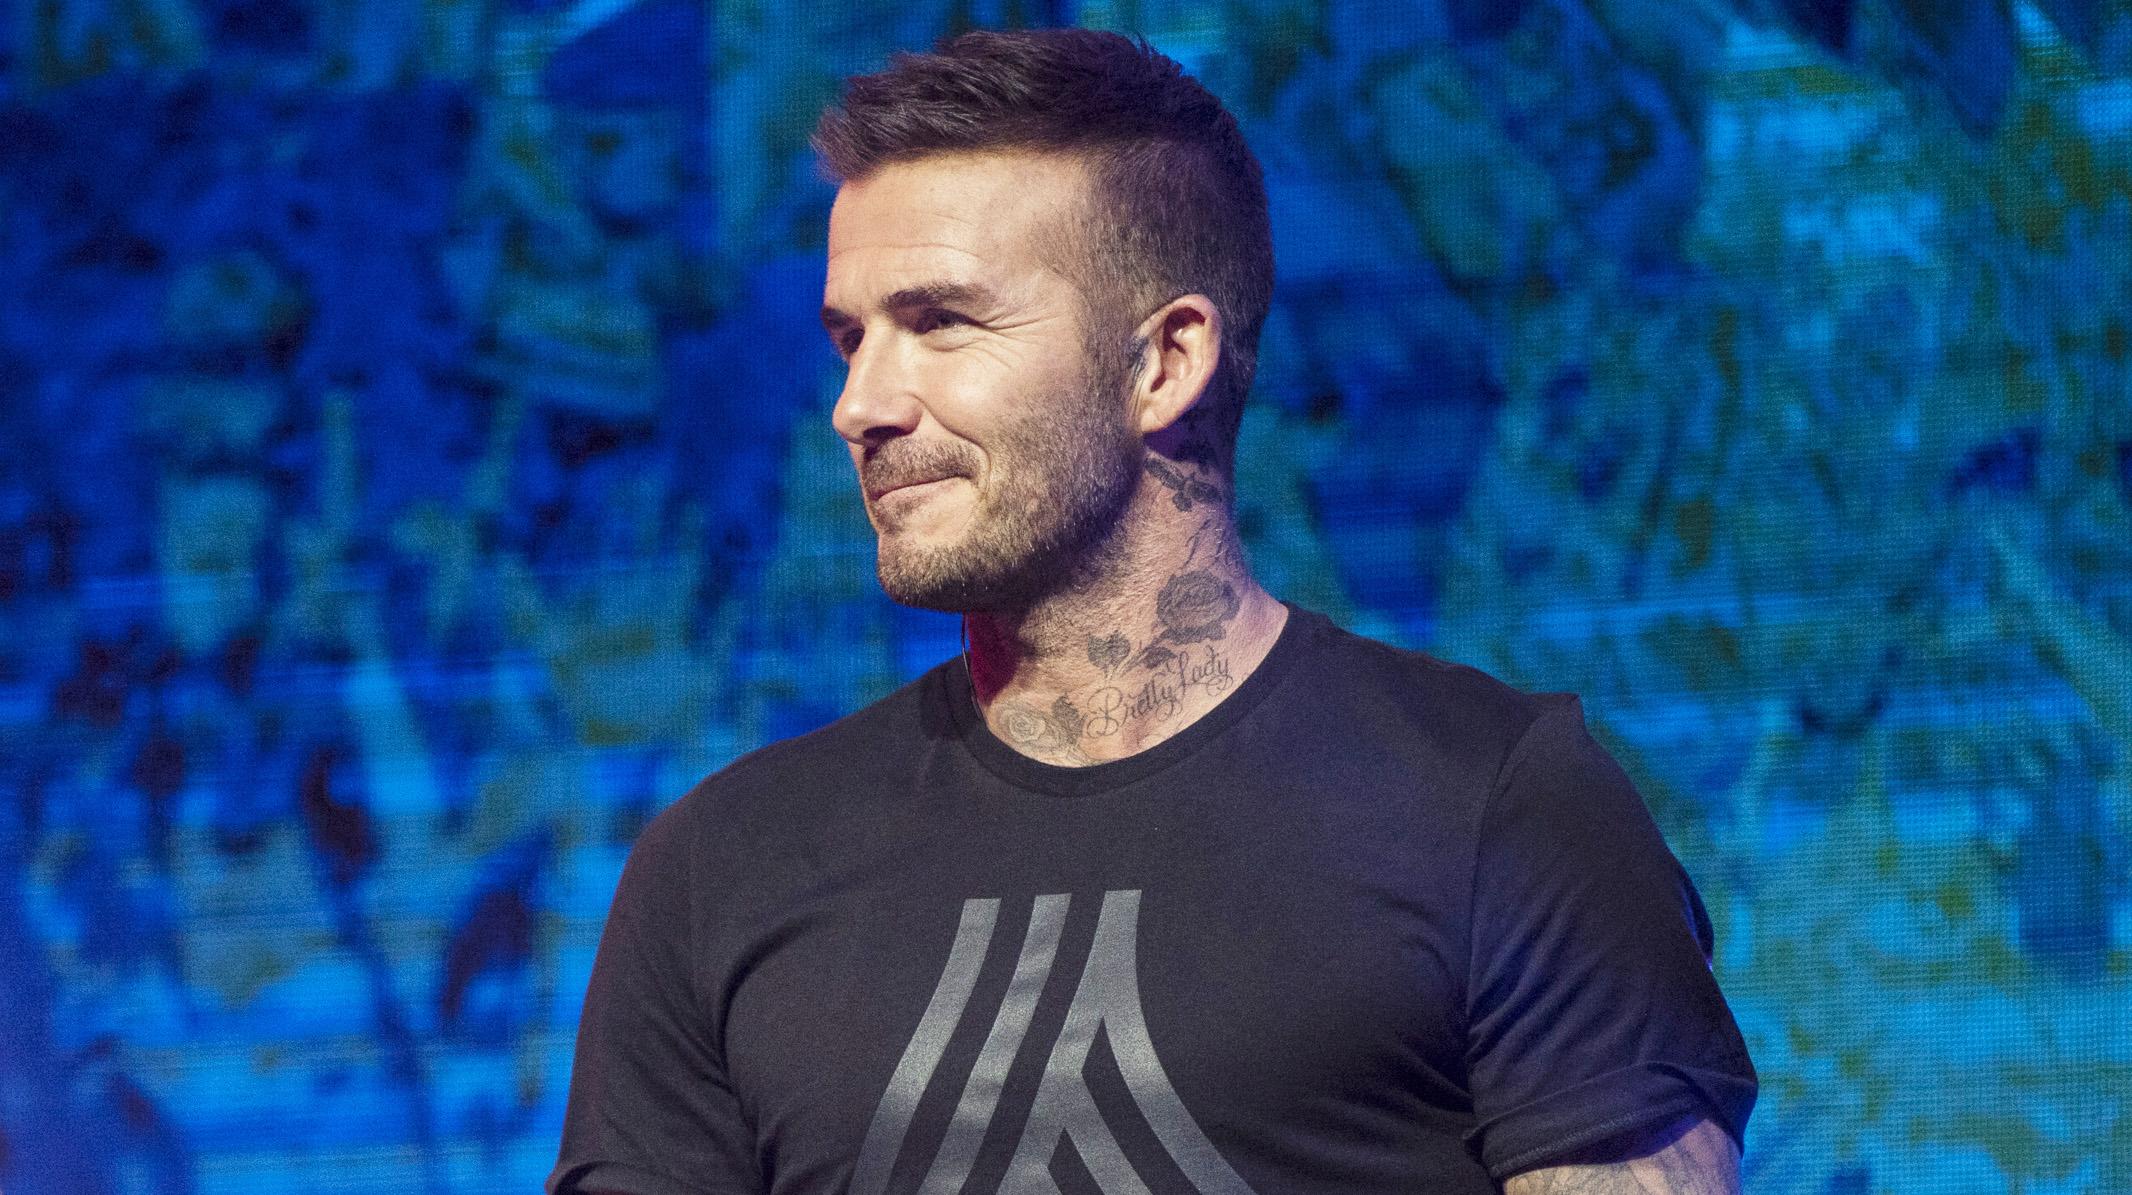 Coupe du monde - David Beckham voit une finale Argentine-Angleterre